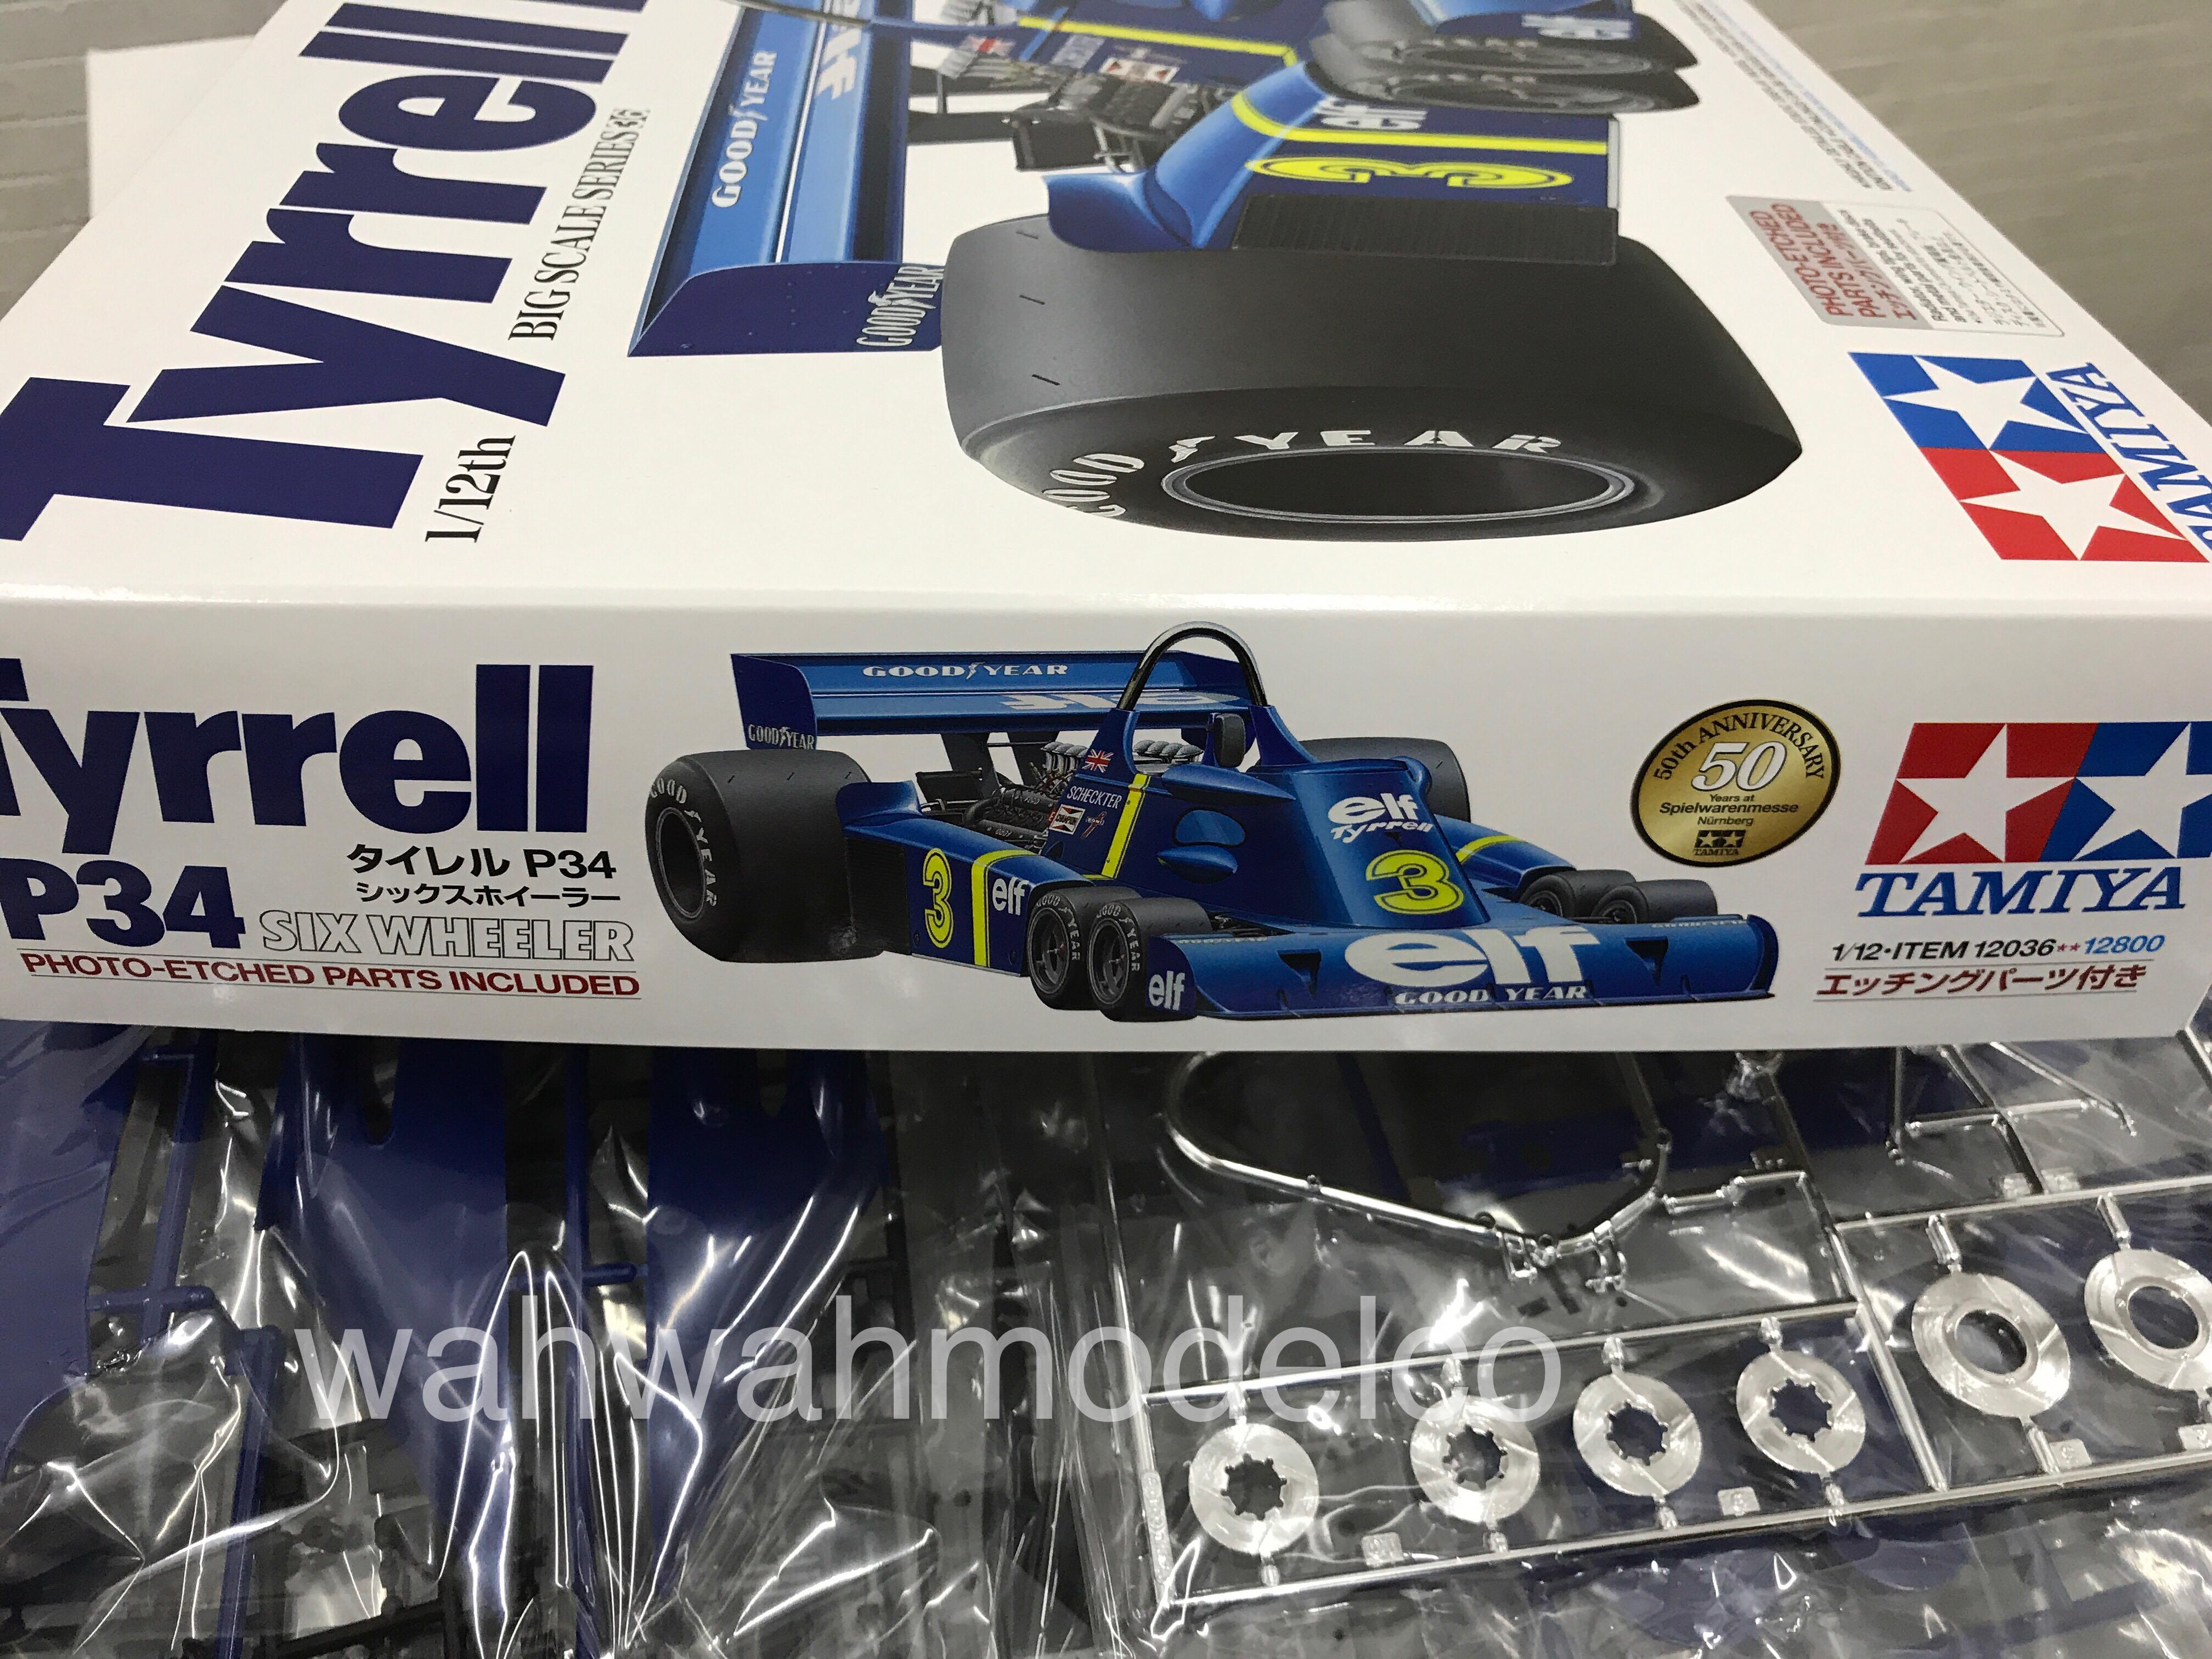 tamiya  tyrrell p  wheeler  photo etched parts   formula